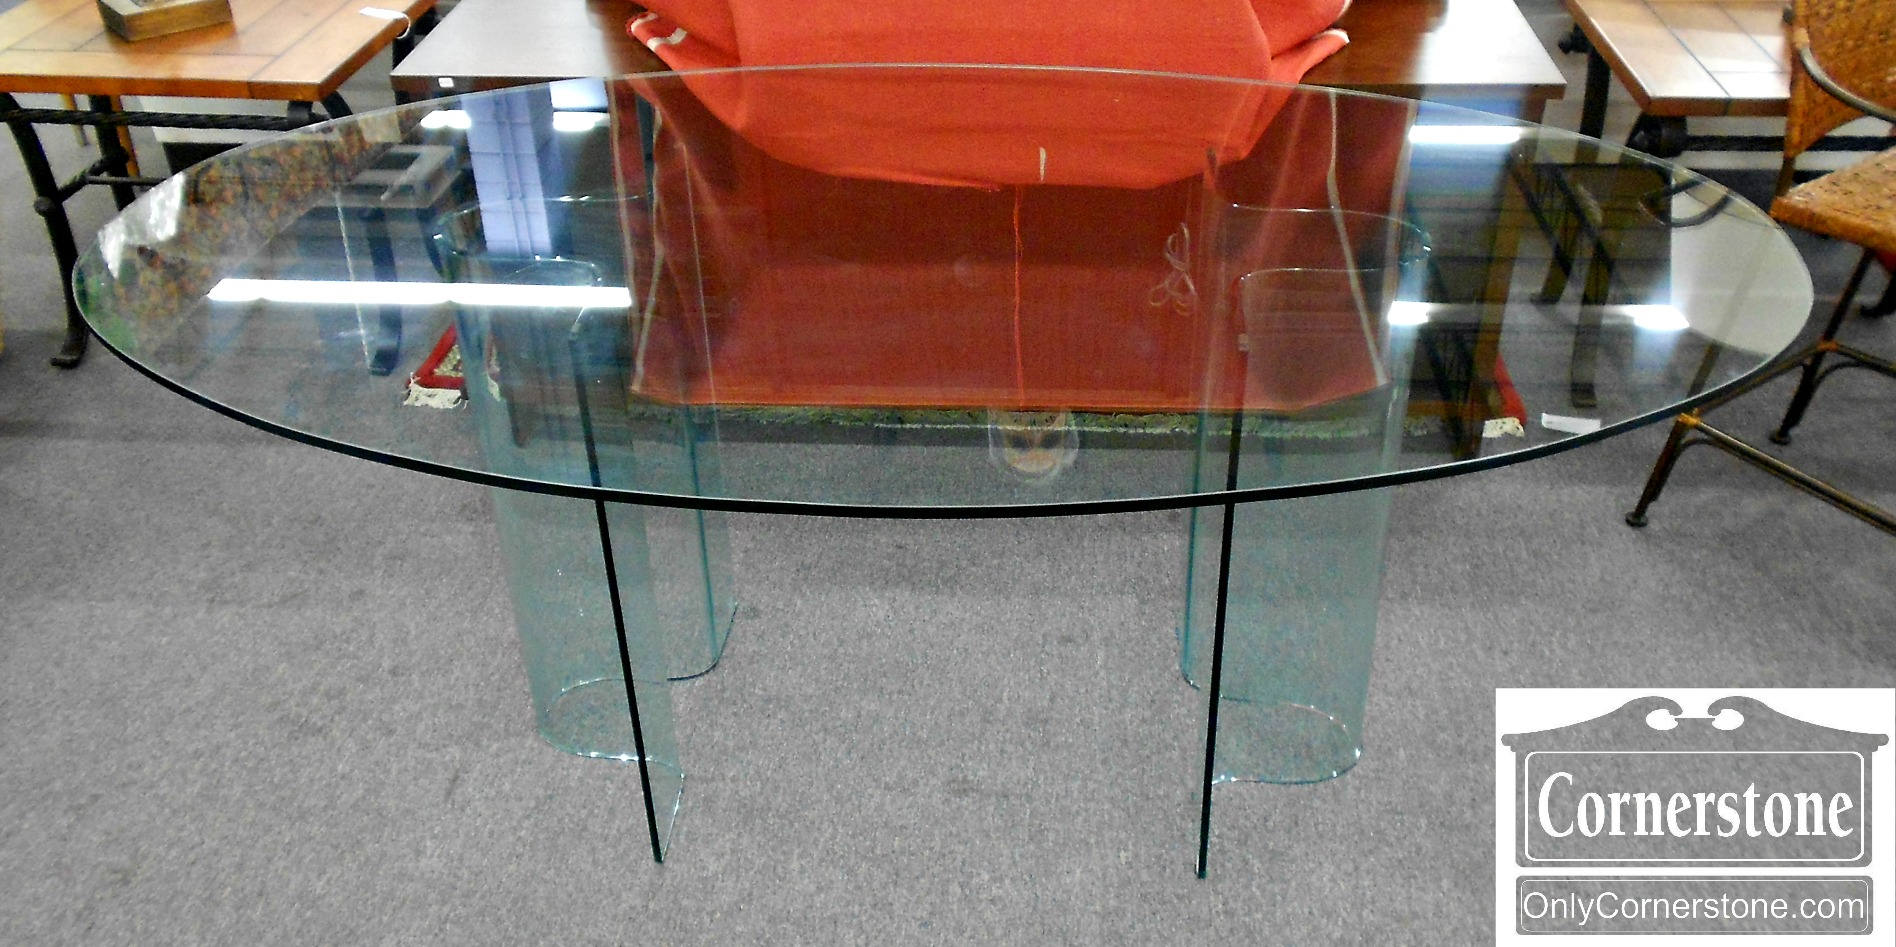 5666-461 Fiam Italia Contemporary Oval Glass Dining Table